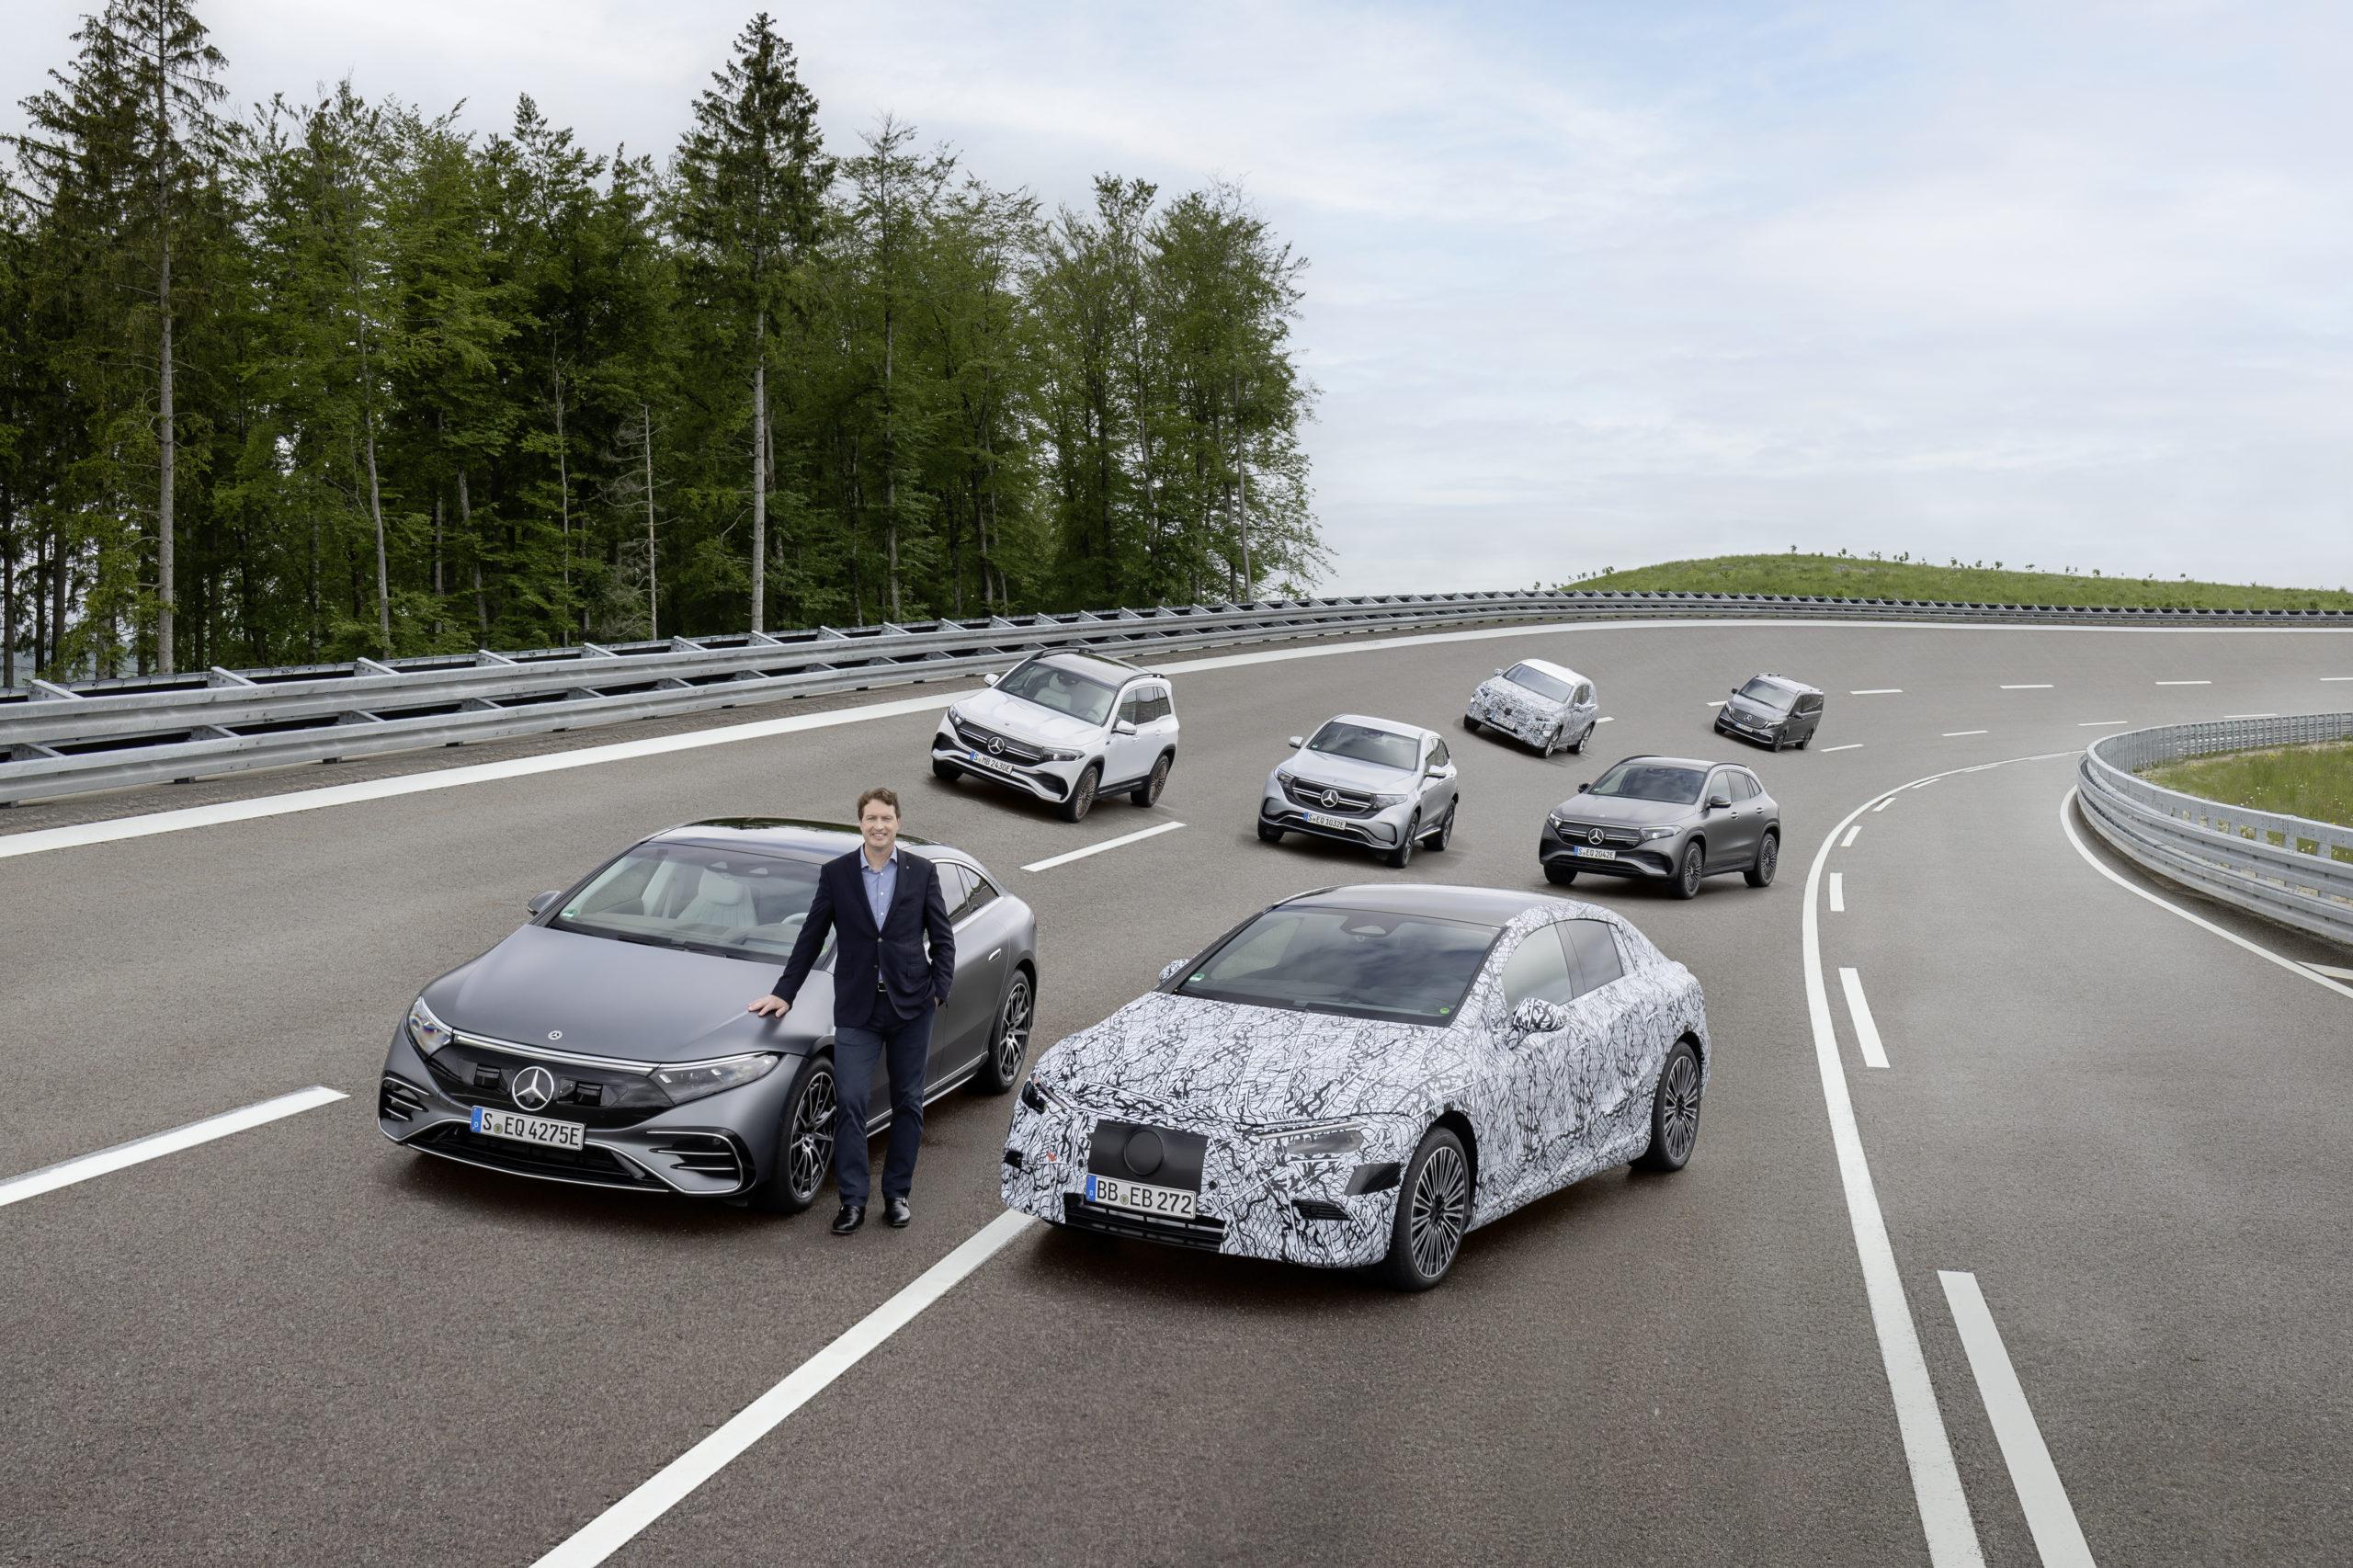 Mercedes-Benz CEO Ola Källenius stands beside a fleet of electric vehicles. (Mercedes-Benz)